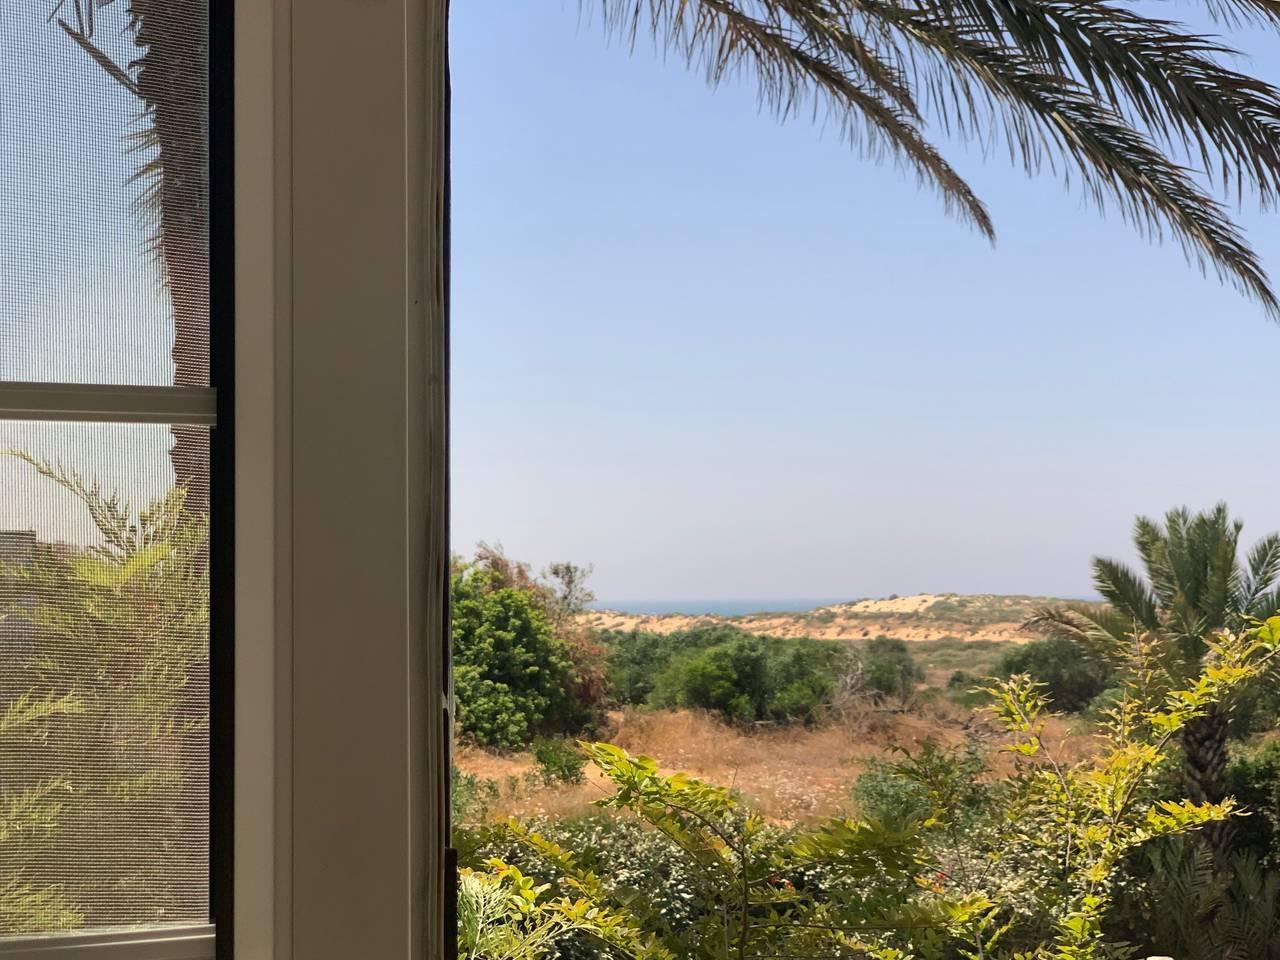 Apartment Dream house by the sea in Caesarea photo 25979674